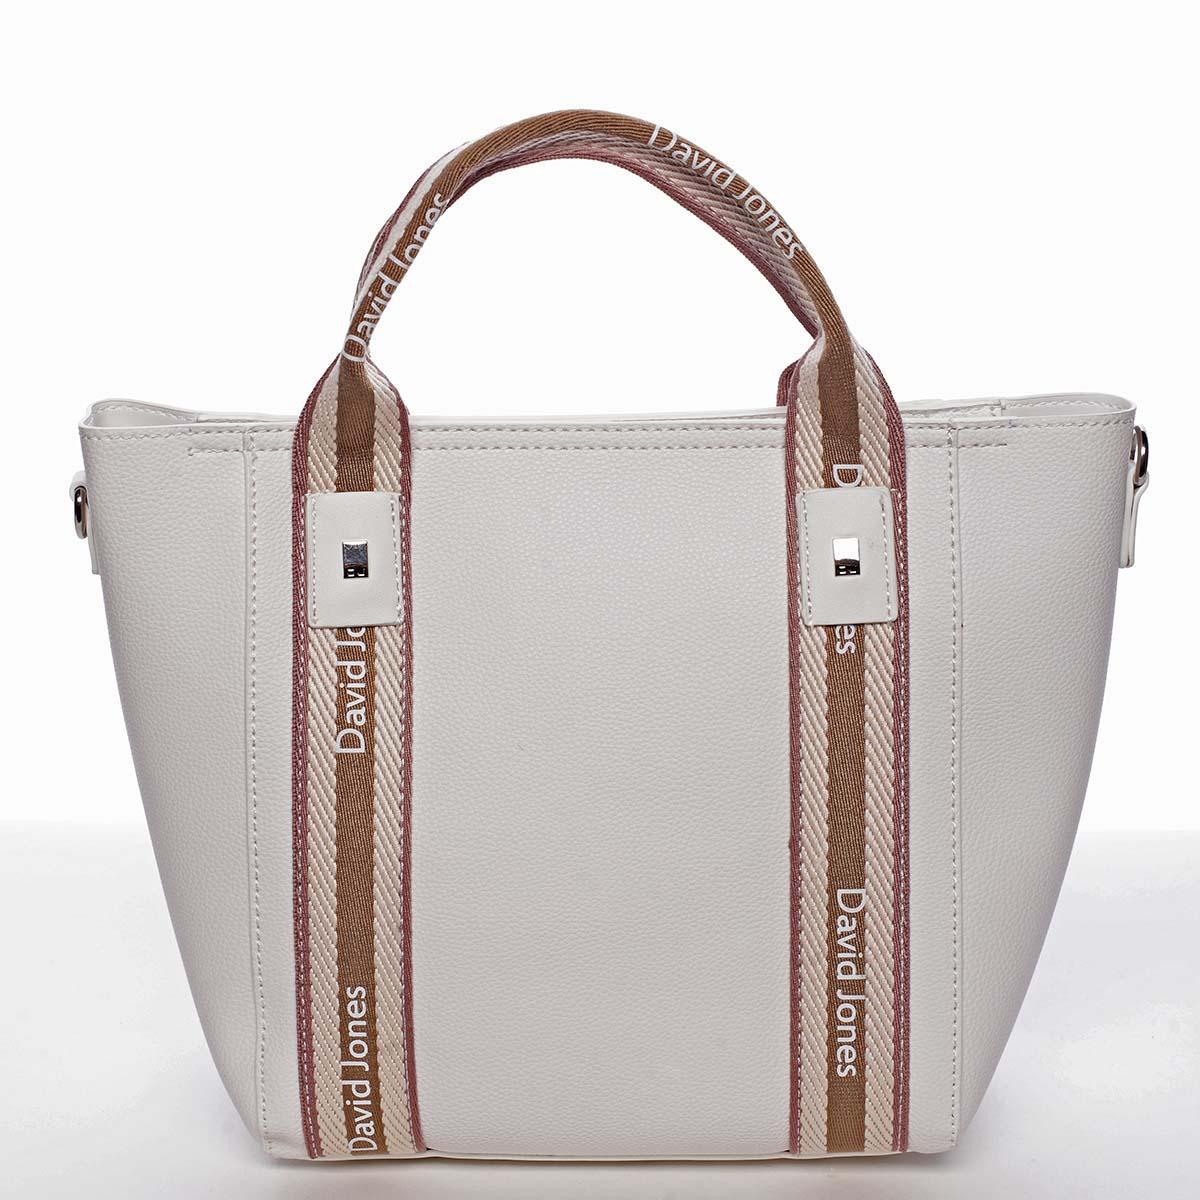 Moderná dámska biela kabelka do ruky - David Jones Agna